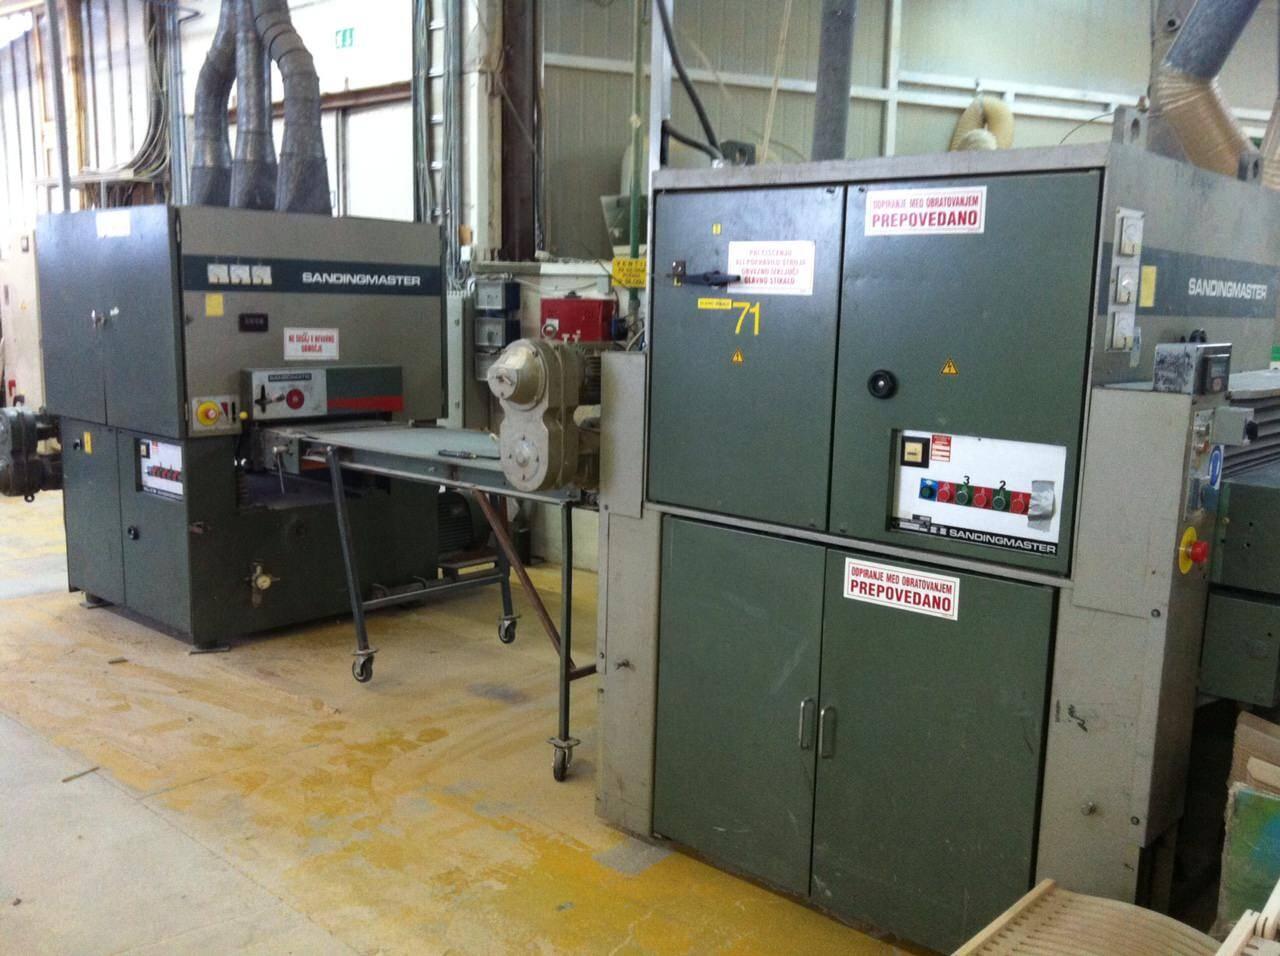 Sandingmaster Calibrating Line Second Hand Promas